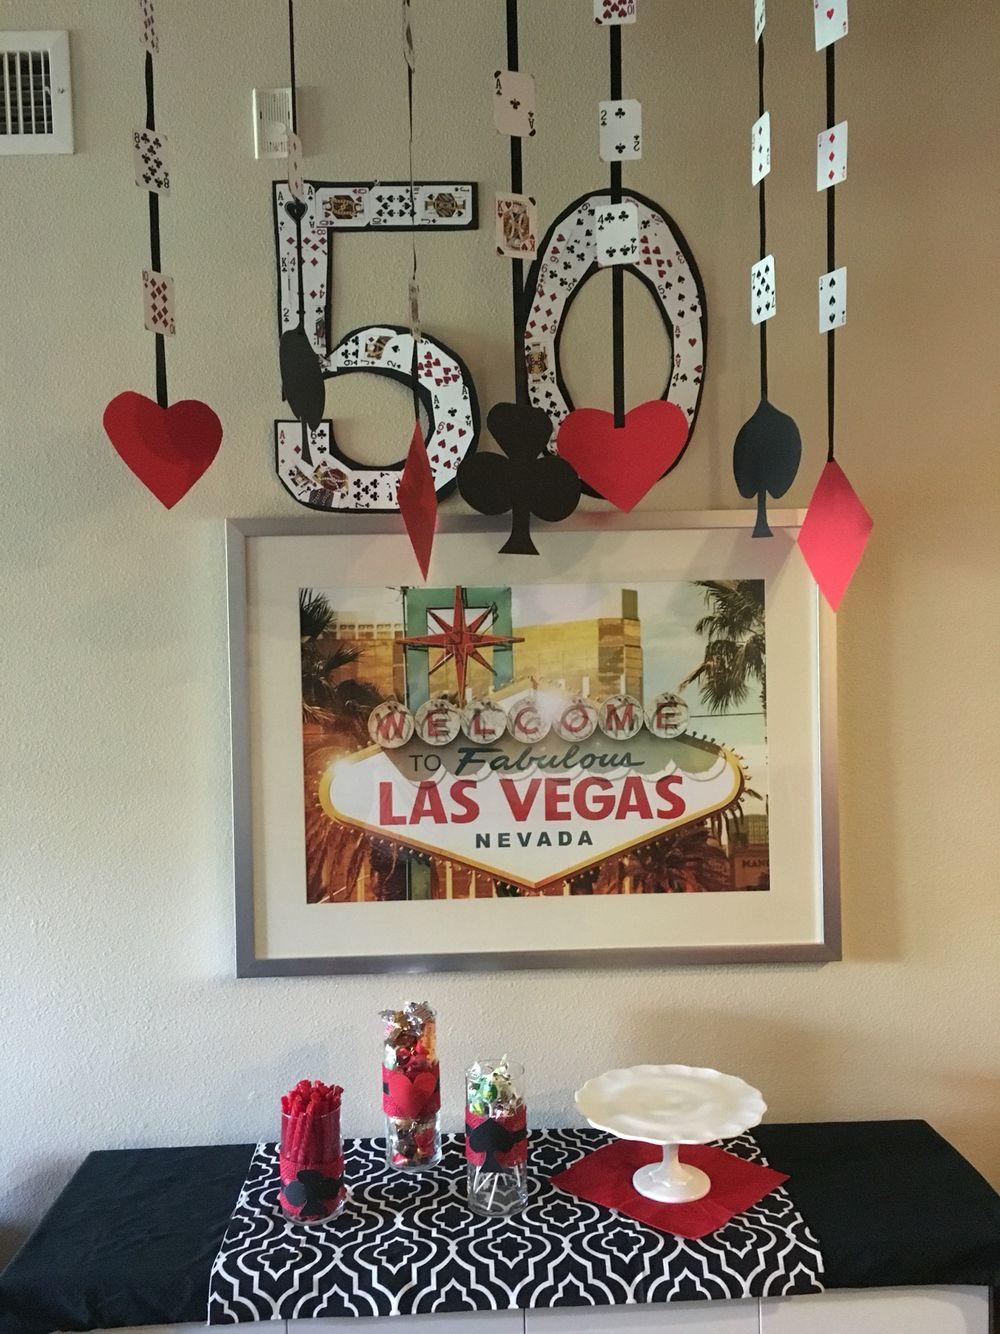 Pin by Melinda Juarez on Albert's 50th birthday. Vegas